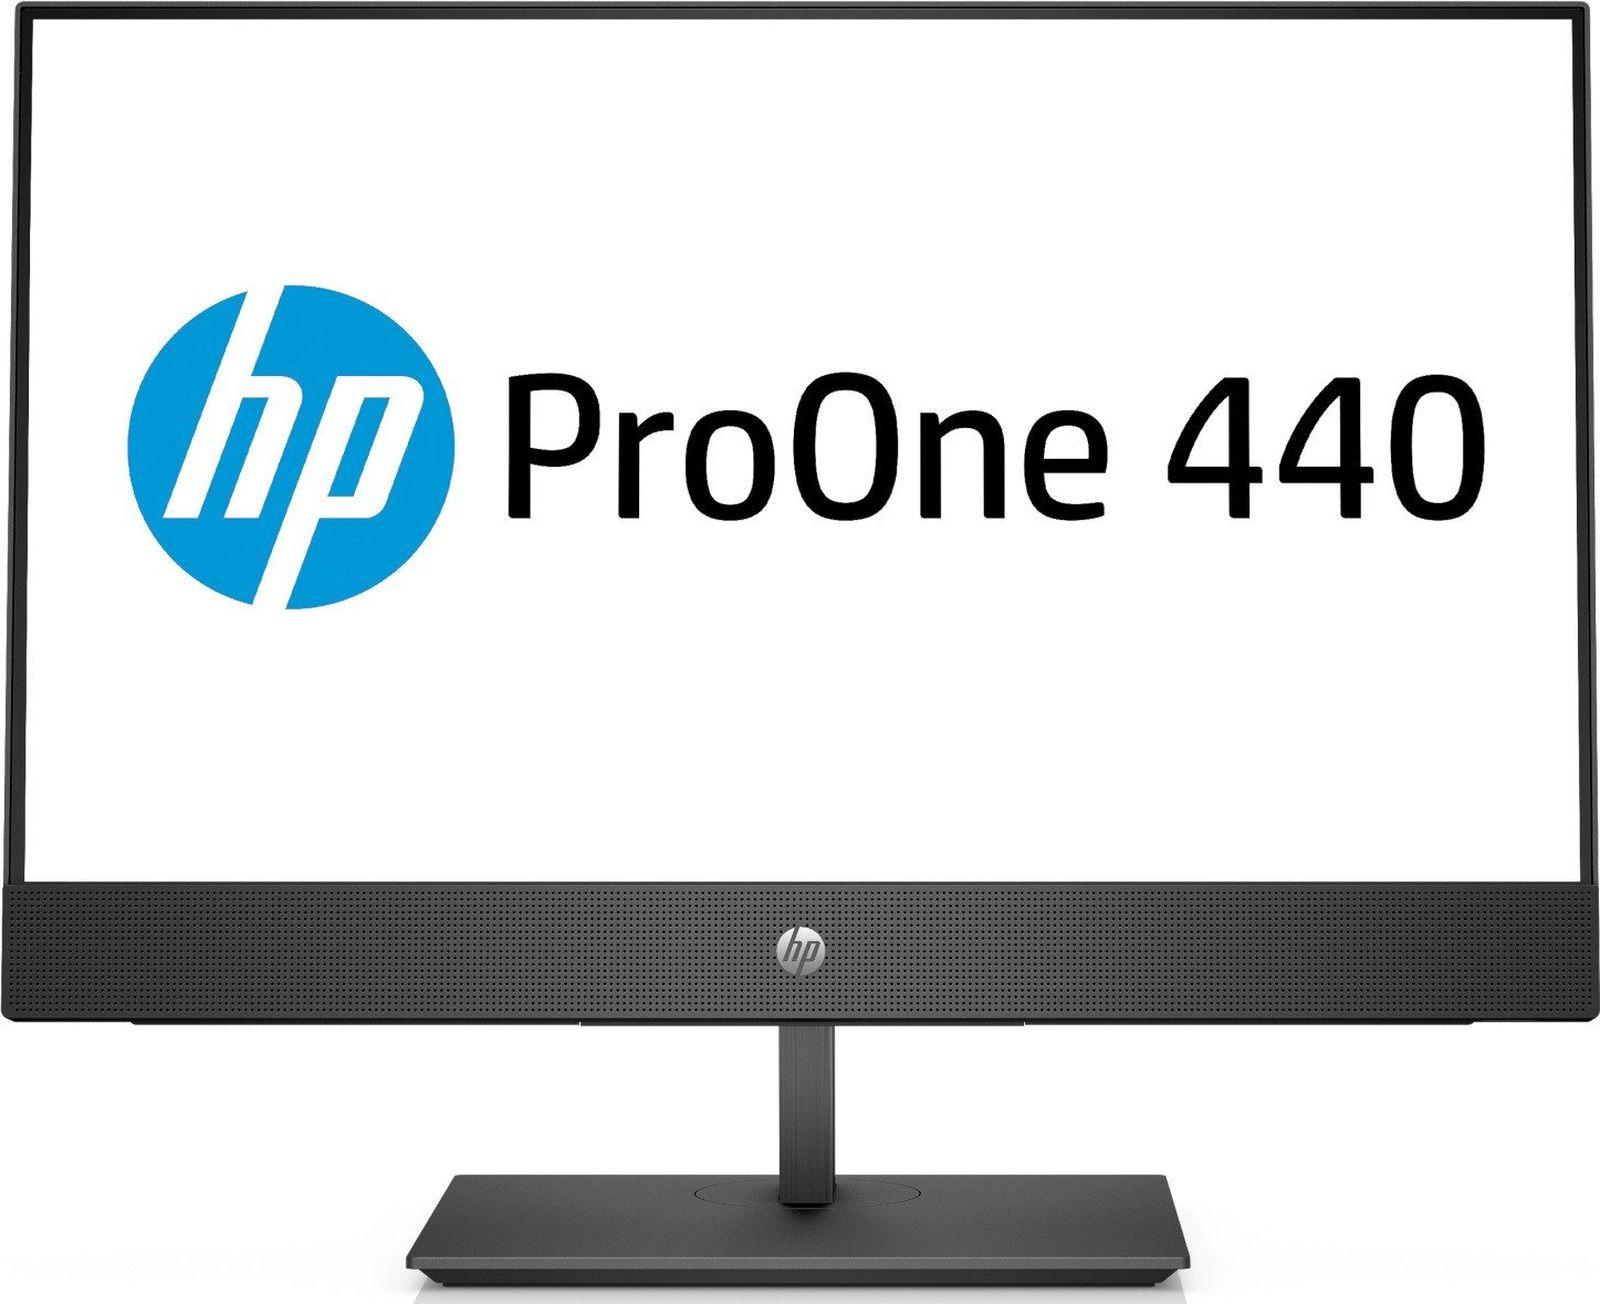 Моноблок HP ProOne 440 G4, 4NT88EA, 23.8, черный